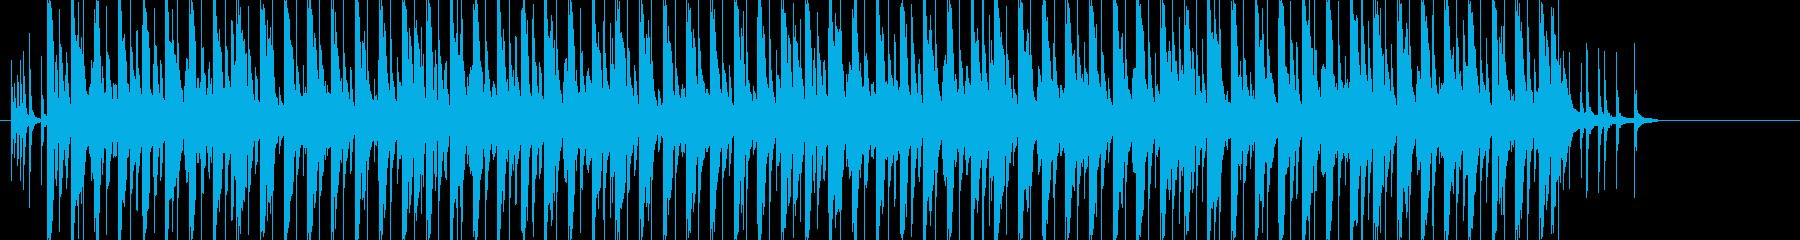 CM WEB BGM ほのぼの系の再生済みの波形